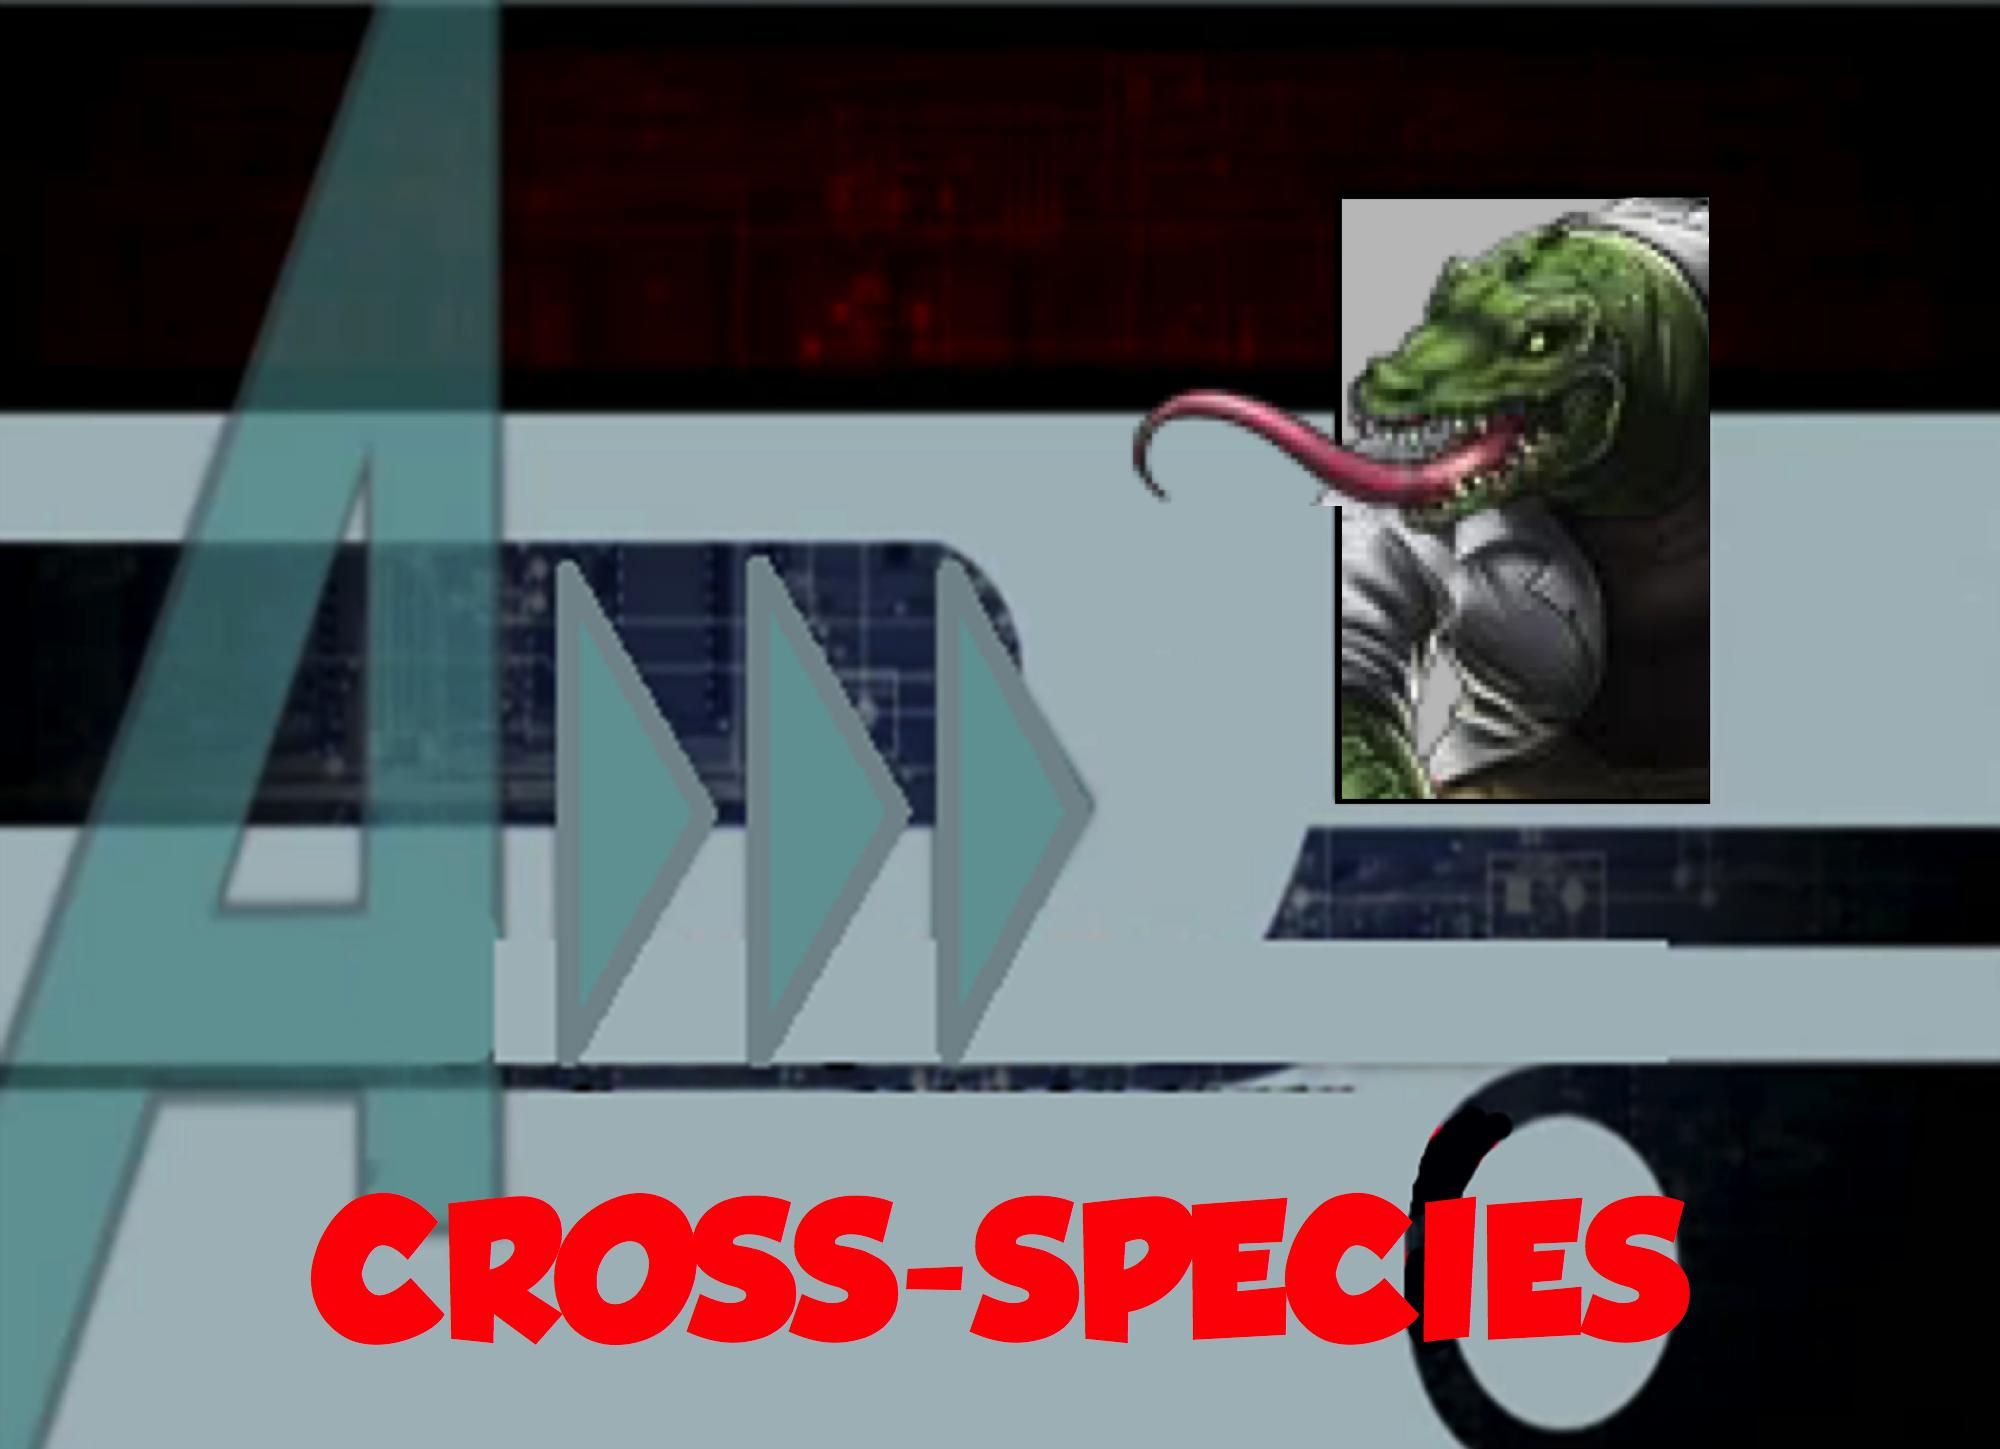 Cross-Species (A!)